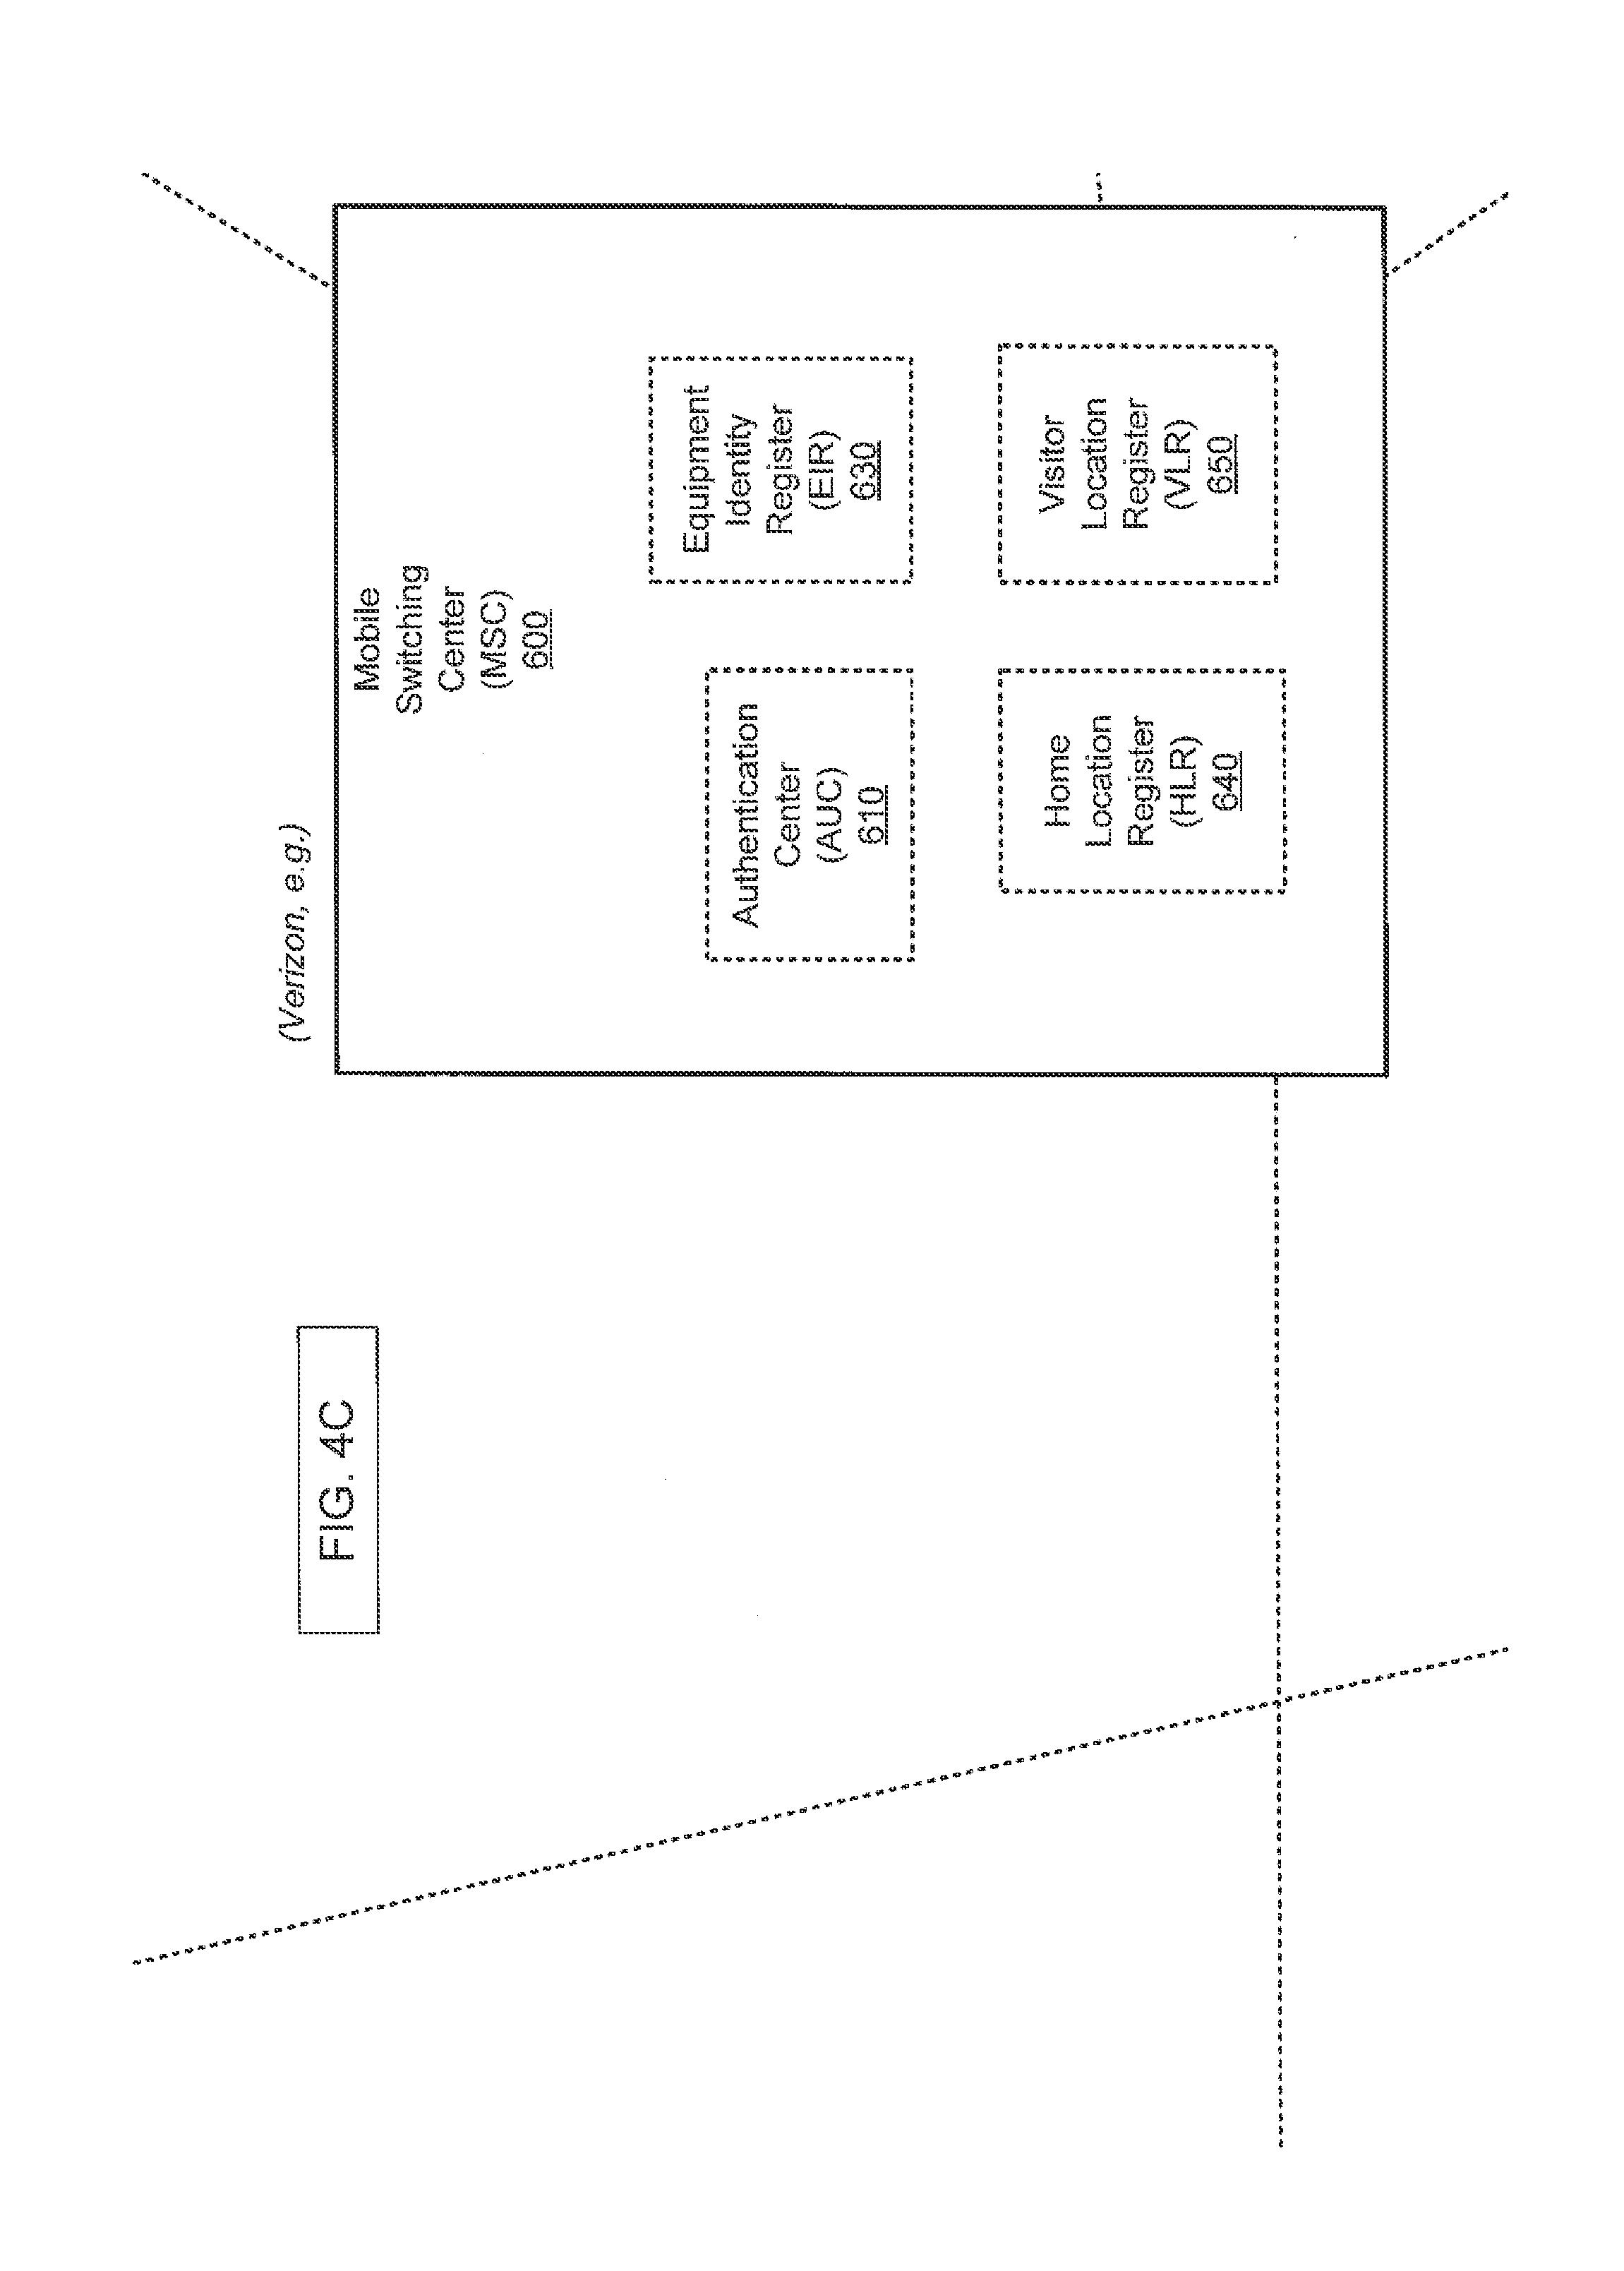 Patent US 9,813,887 B2